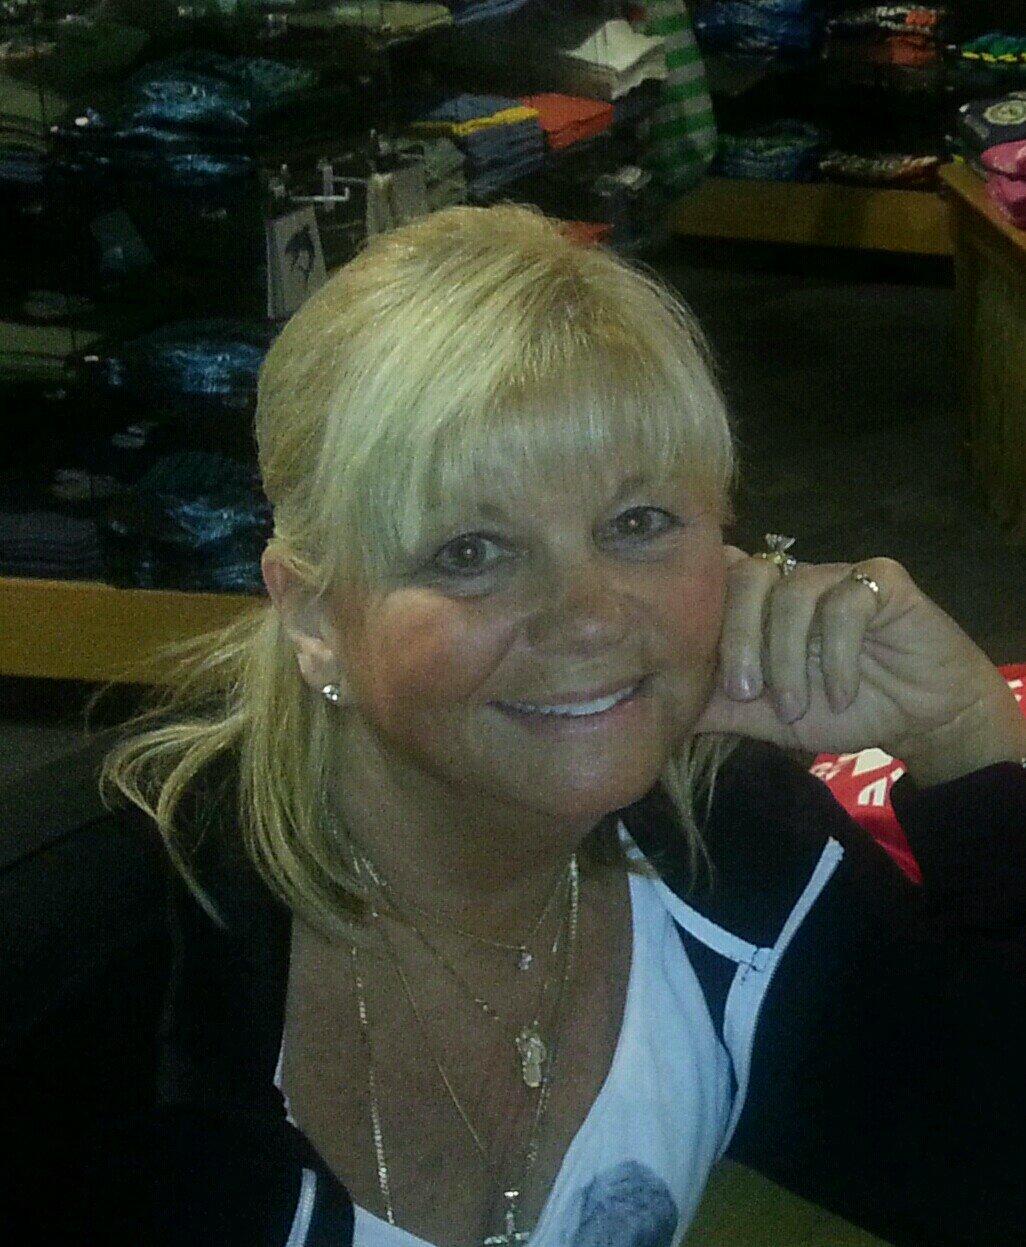 Kim Cattrall,43. Kelly Clarkson XXX clips Nancy Robertson,Eve Plumb